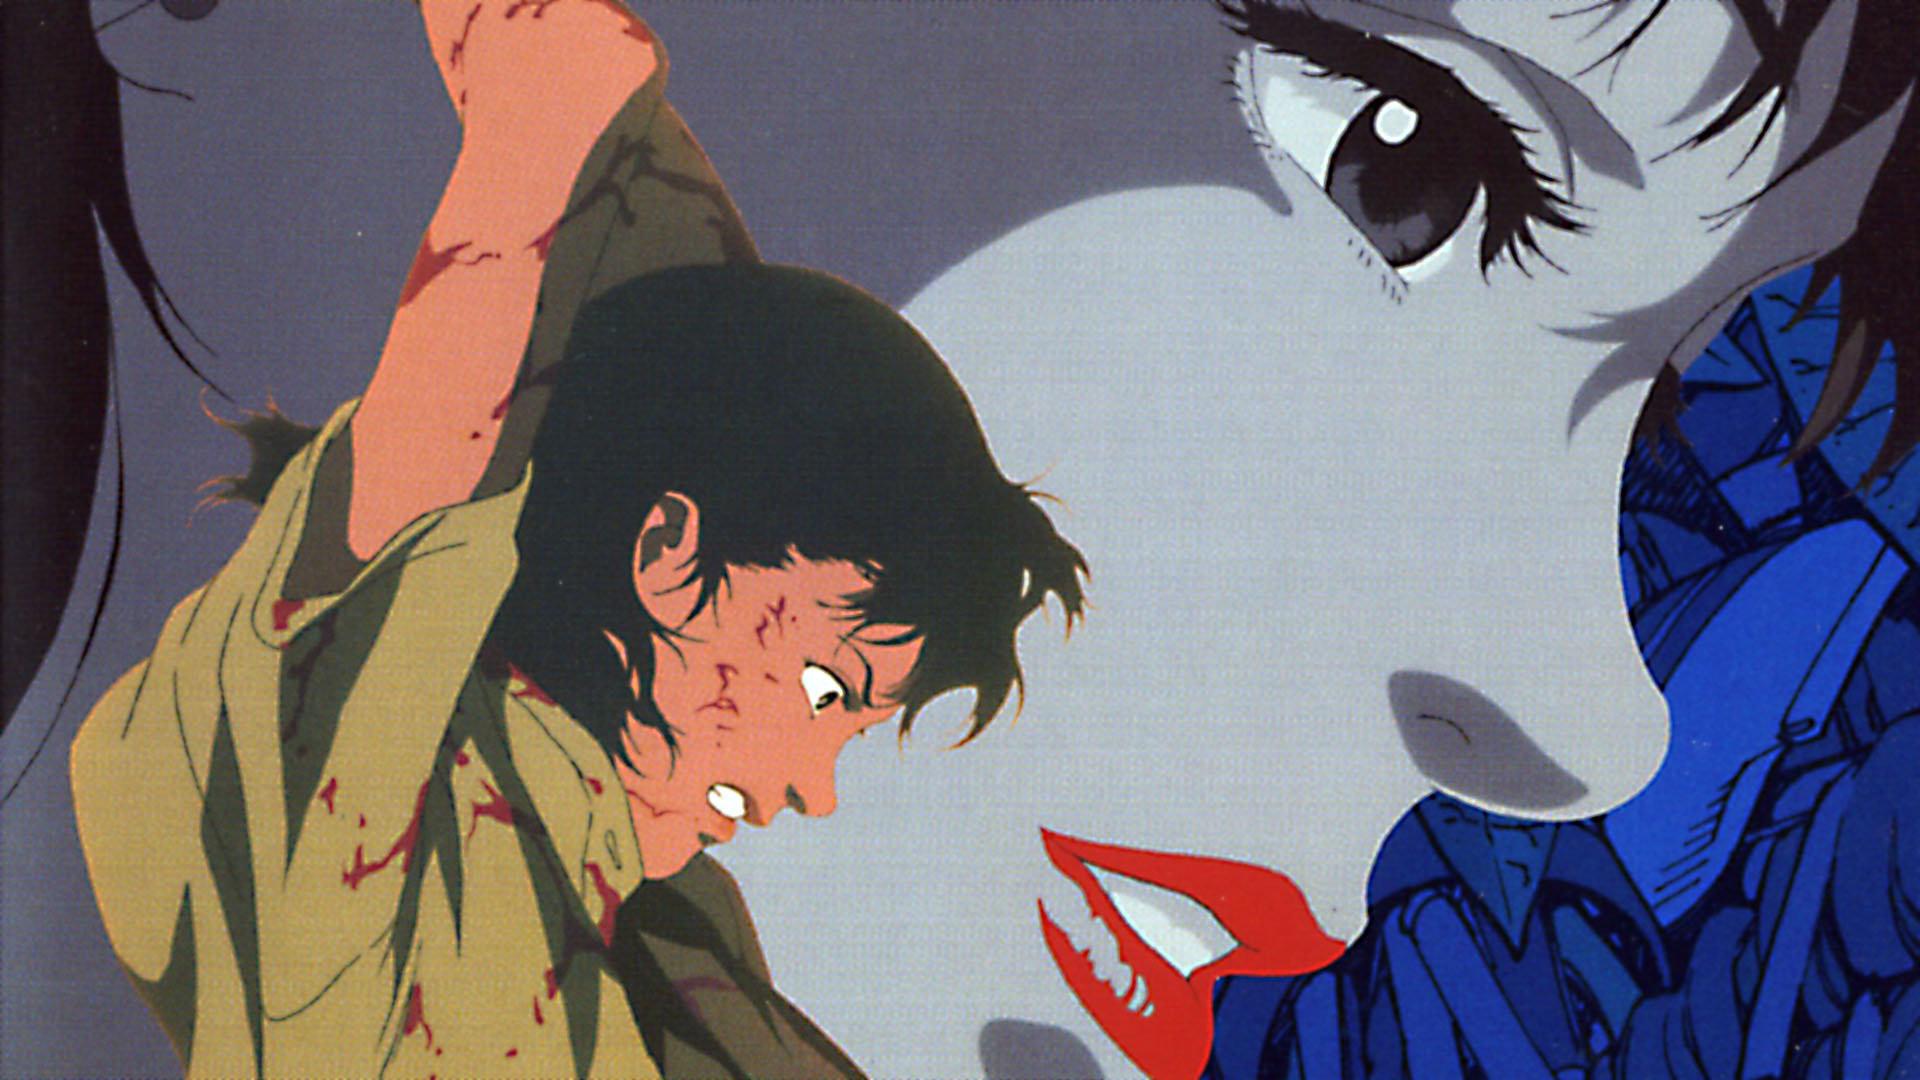 Anime Psychological Horror This psychological thriller